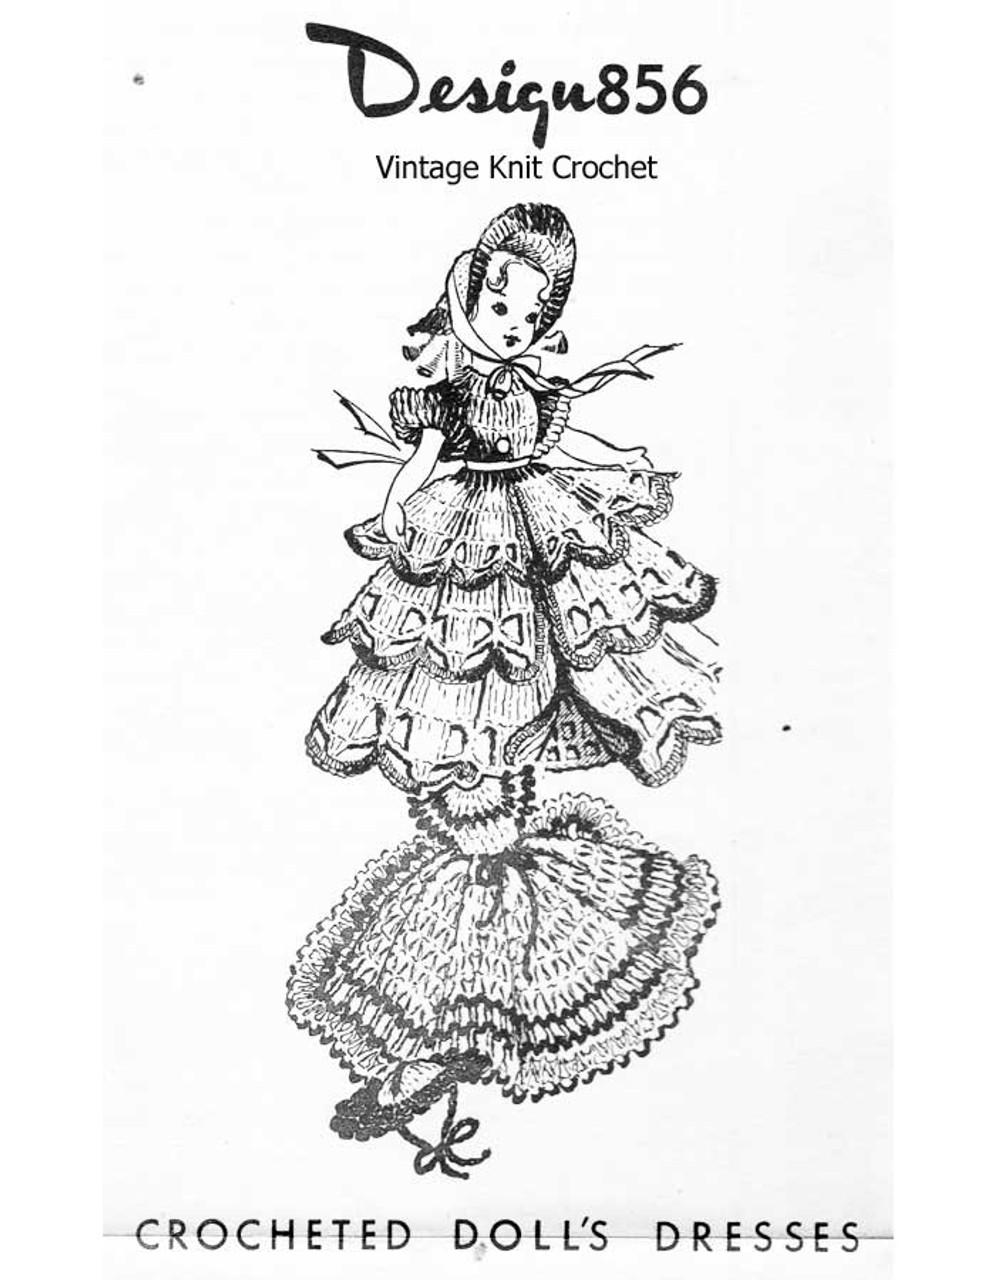 Crochet Ruffled 8 Inch Doll Dress Pattern, Laura Wheeler 856